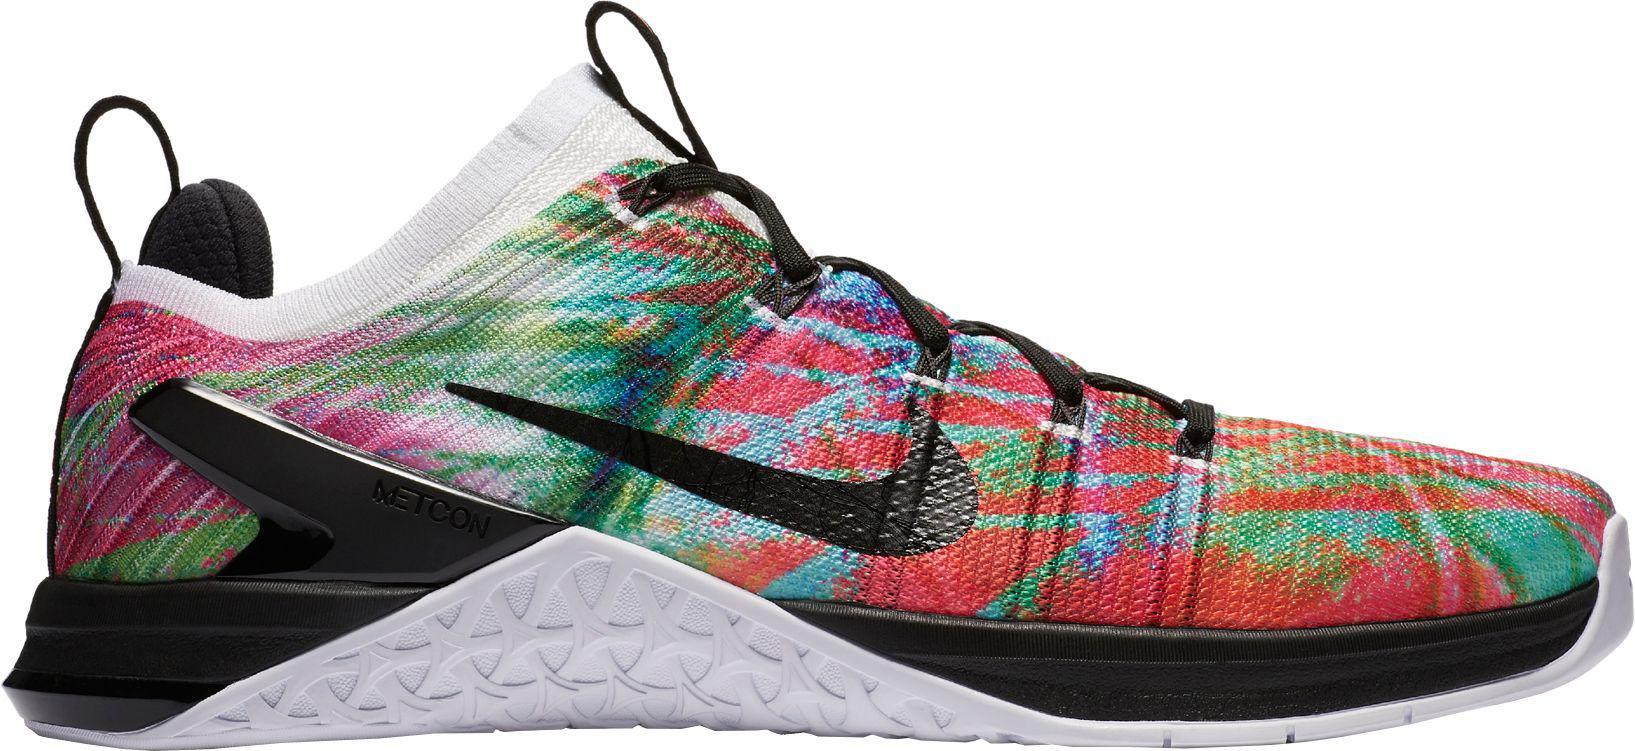 1b515ed9c81fb Nike - Multicolor Metcon Dsx Flyknit 2 Wodapalooza Training Shoes for Men -  Lyst